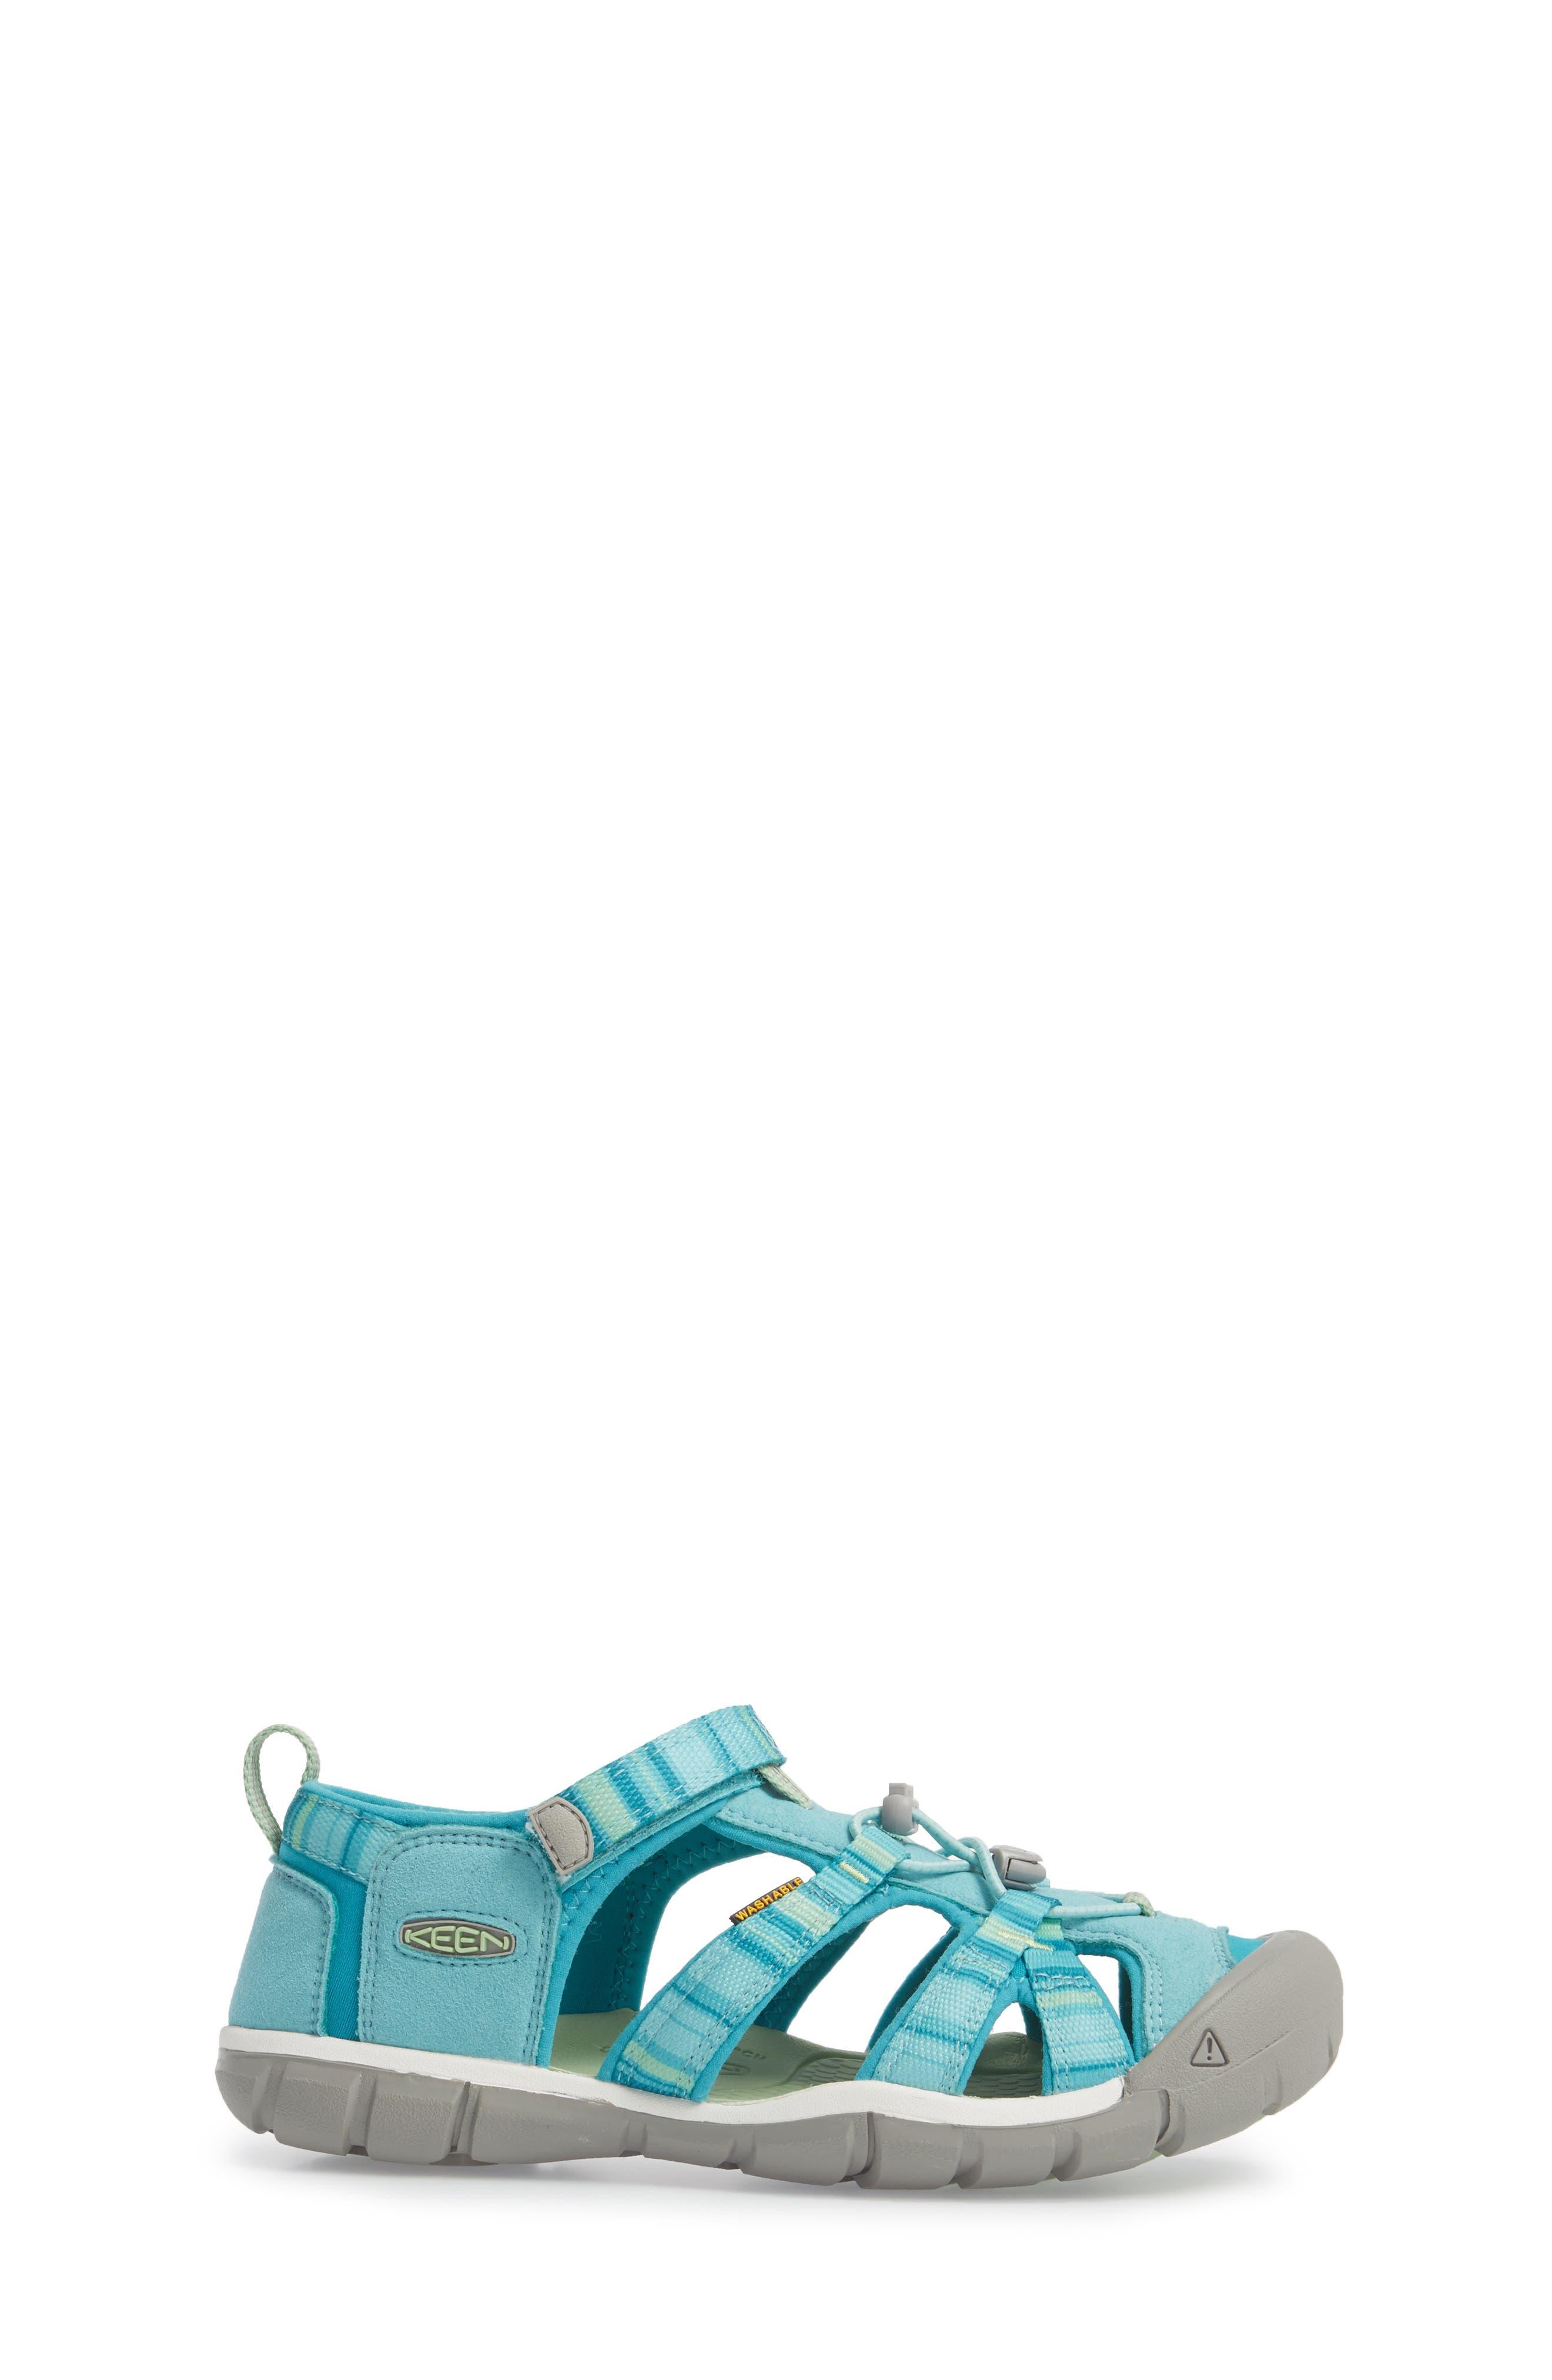 ,                             'Seacamp II' Water Friendly Sandal,                             Alternate thumbnail 170, color,                             406